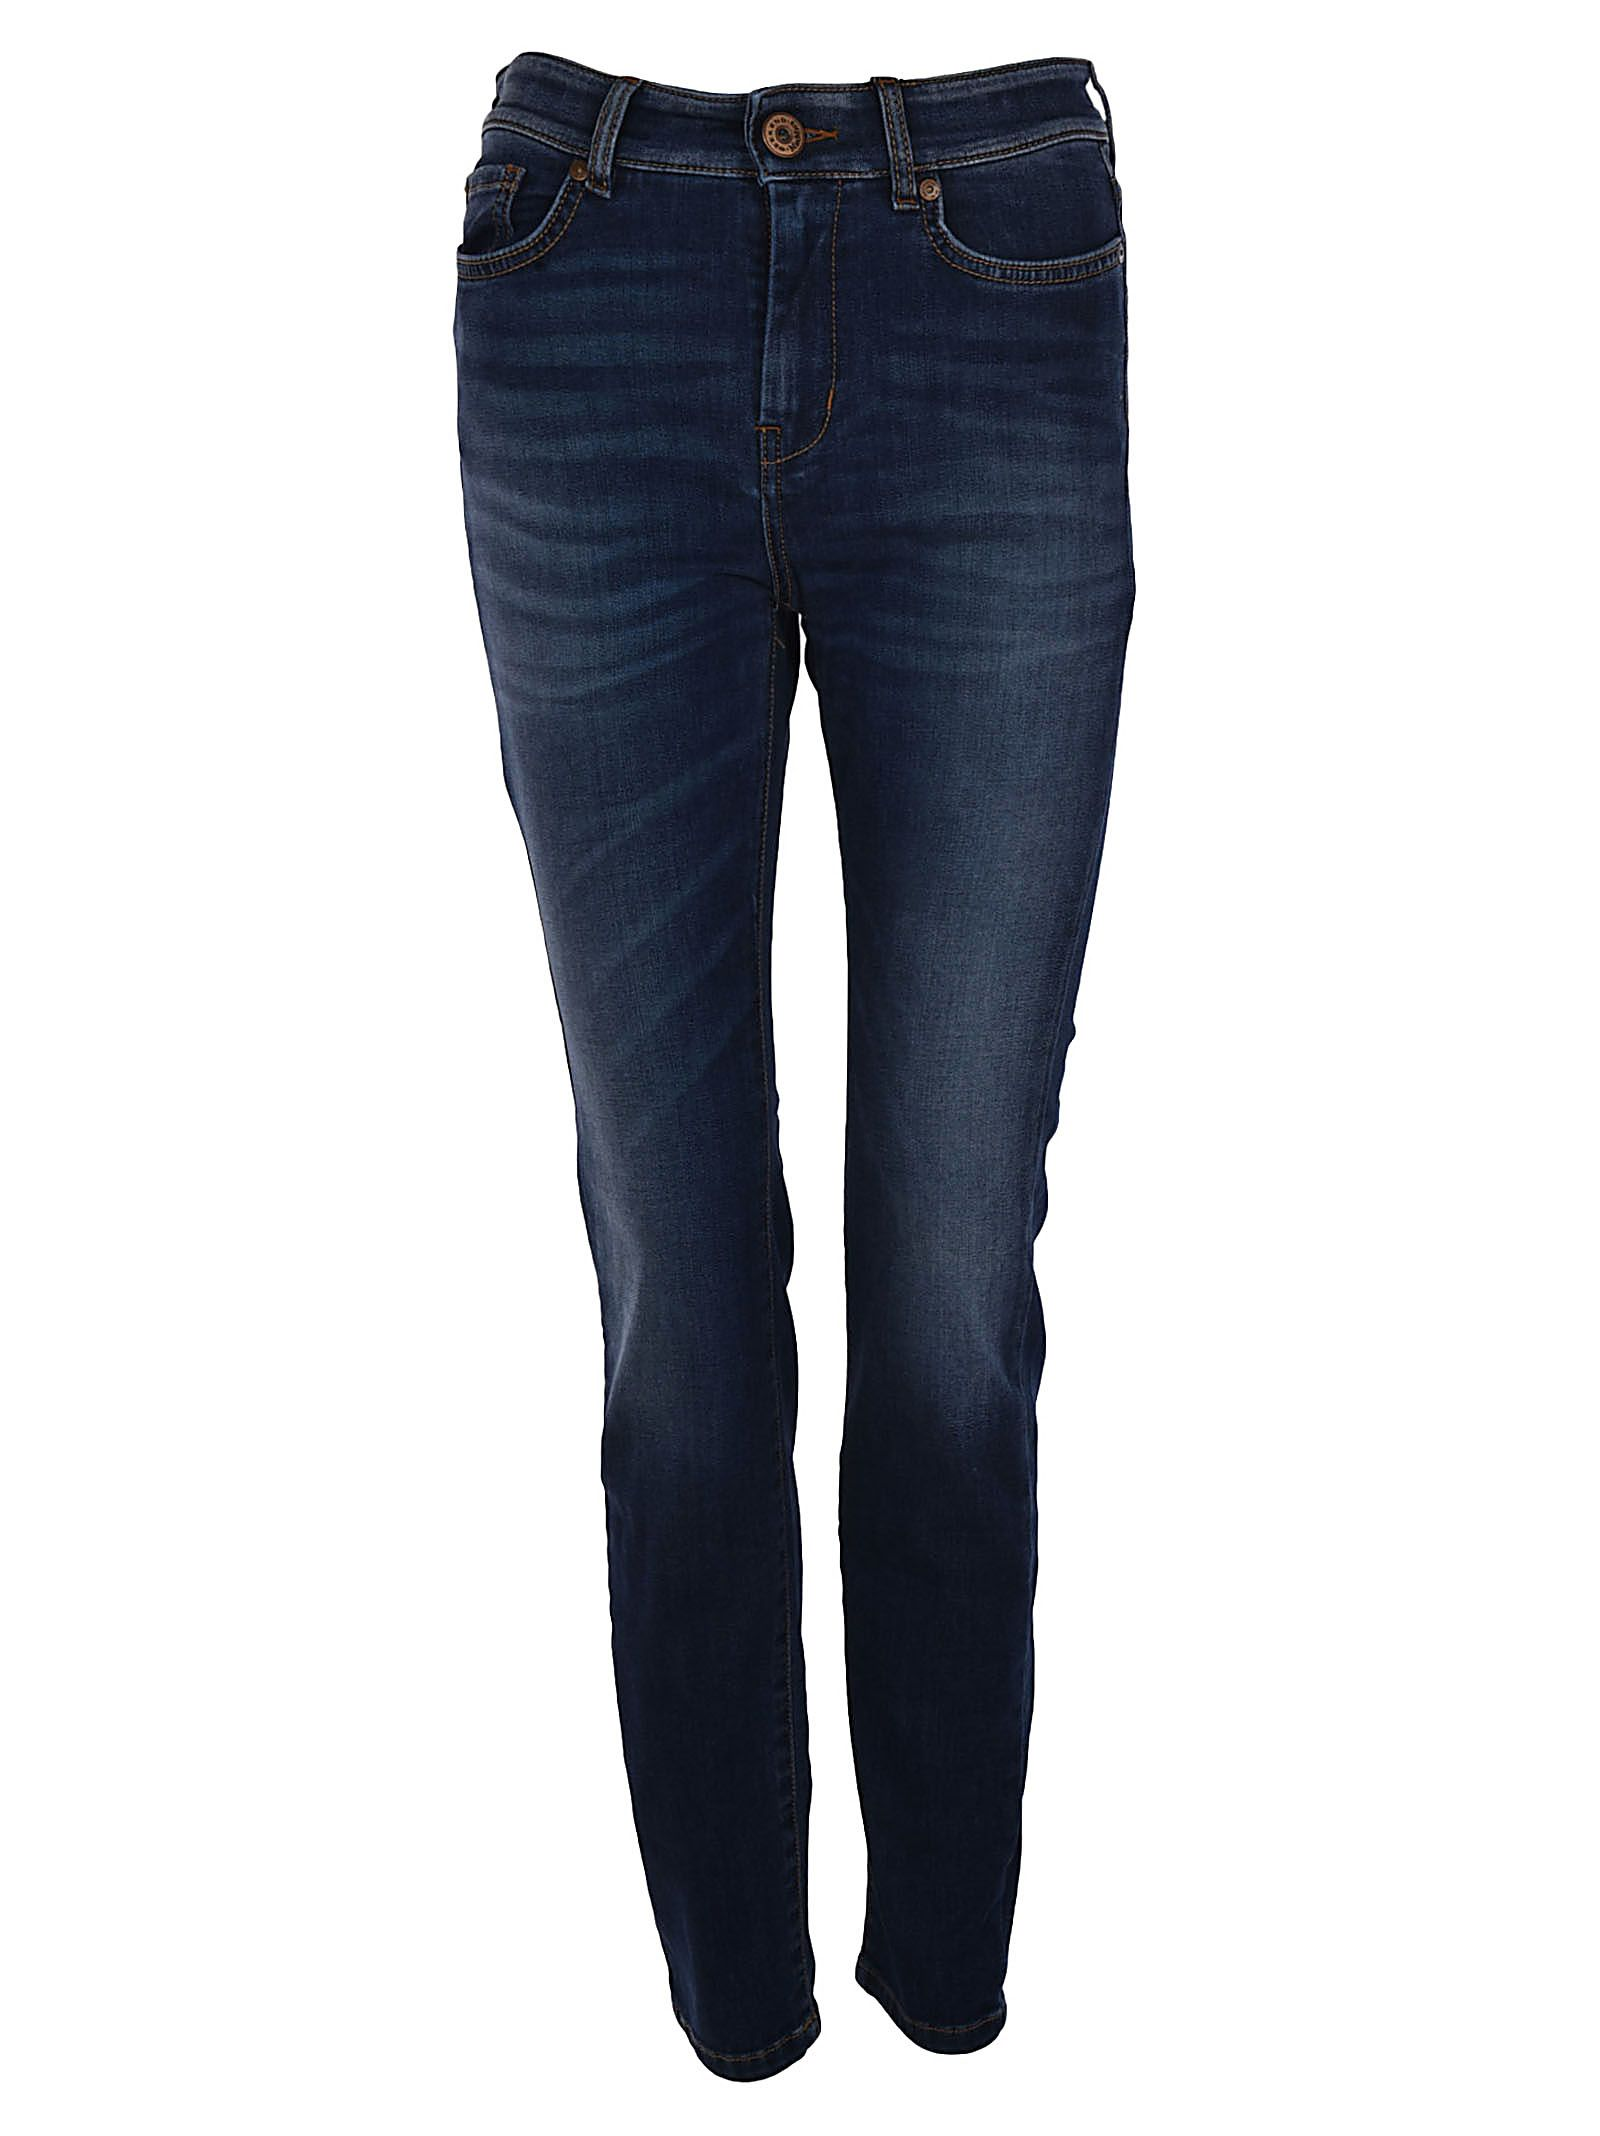 Weekend Faded Jeans